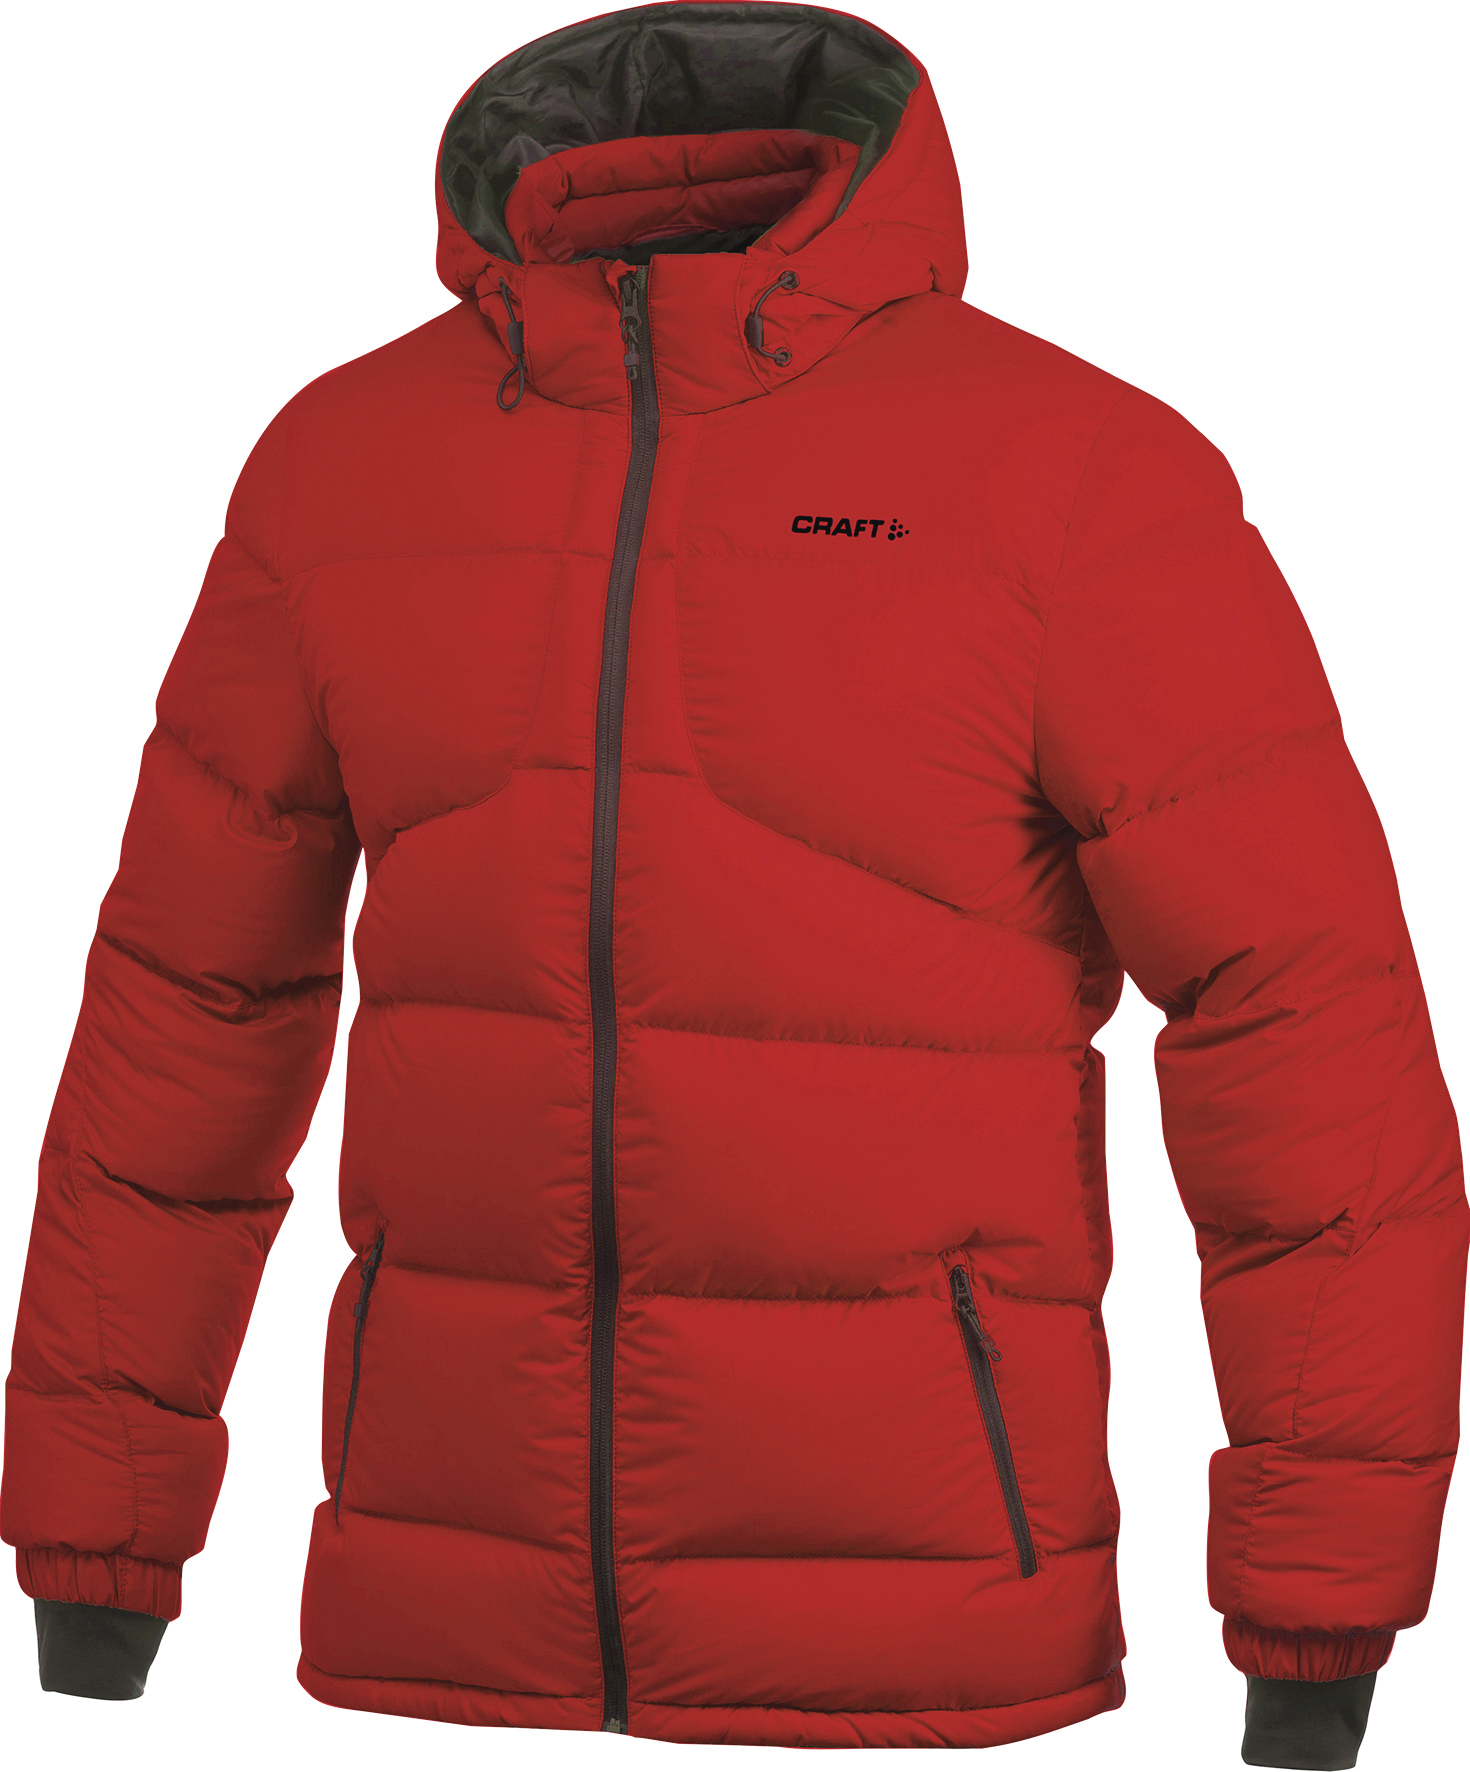 Куртка женская Craft Casual Down пуховая красная 1901855-2430